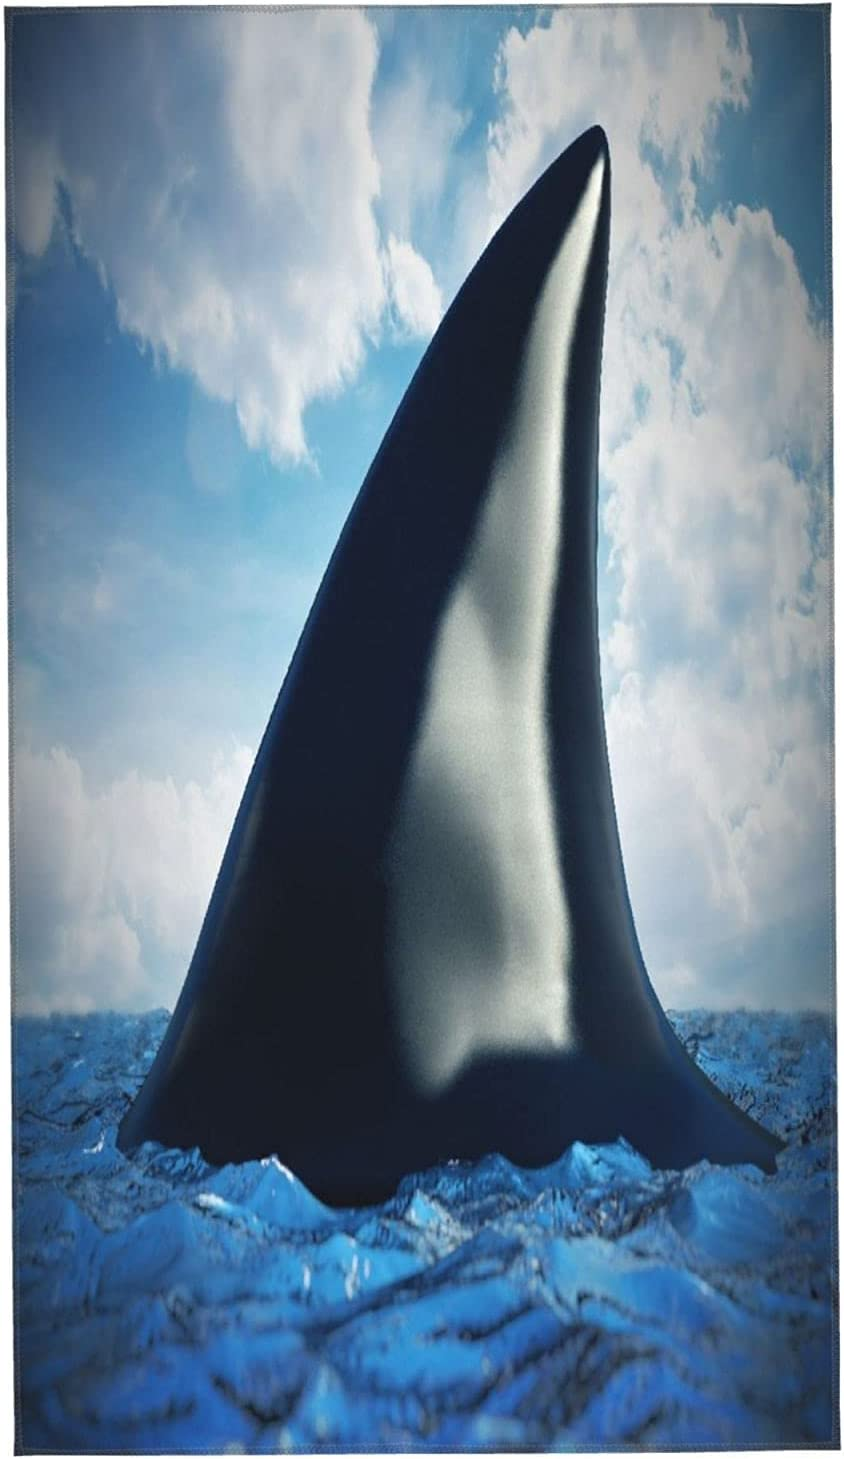 PUNKDBOTTO 2pcs Bath Towels Shark Fin an Max 72% OFF Water Soft 1 year warranty Ultra On The